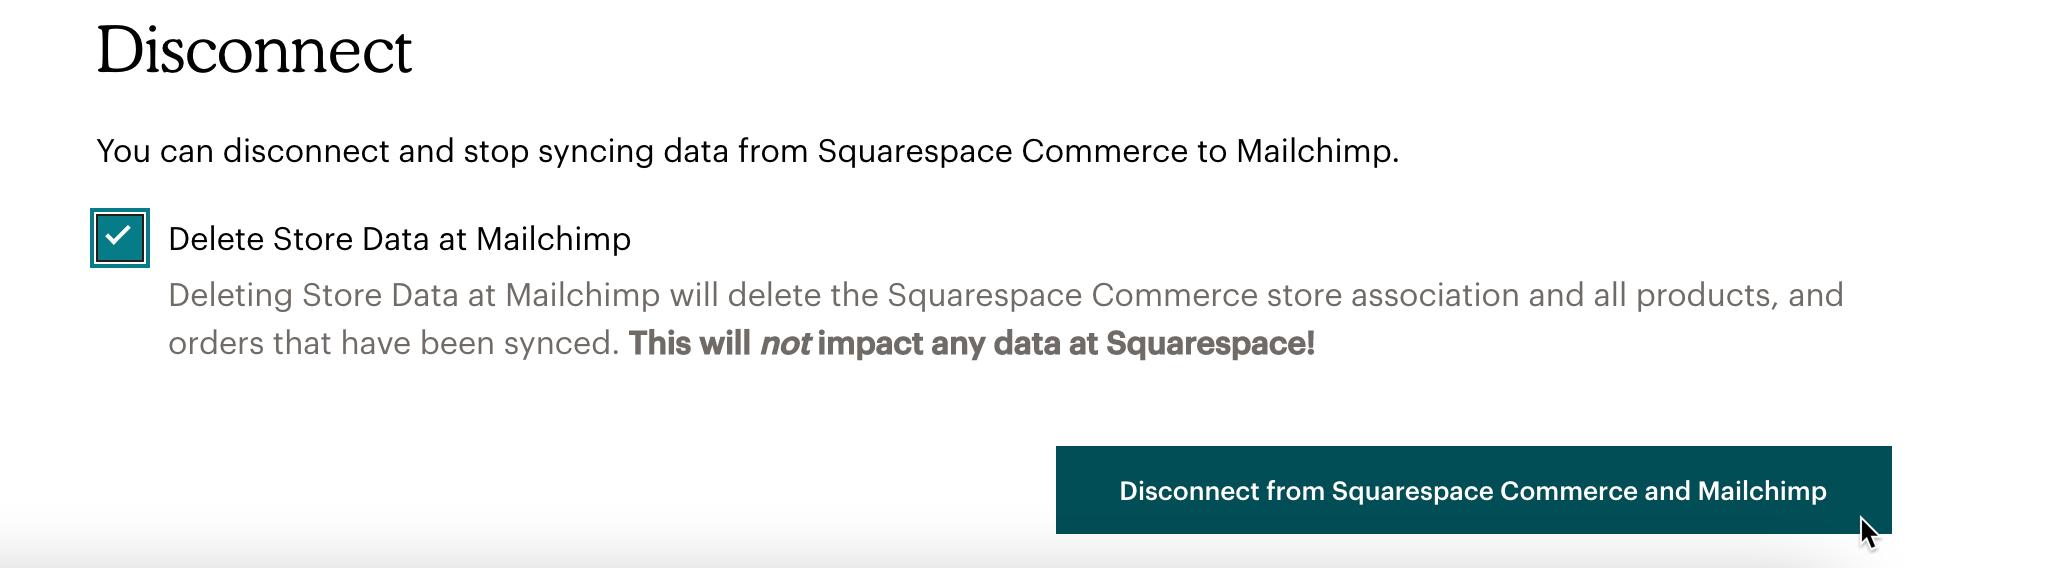 Squarespace-Disconnect